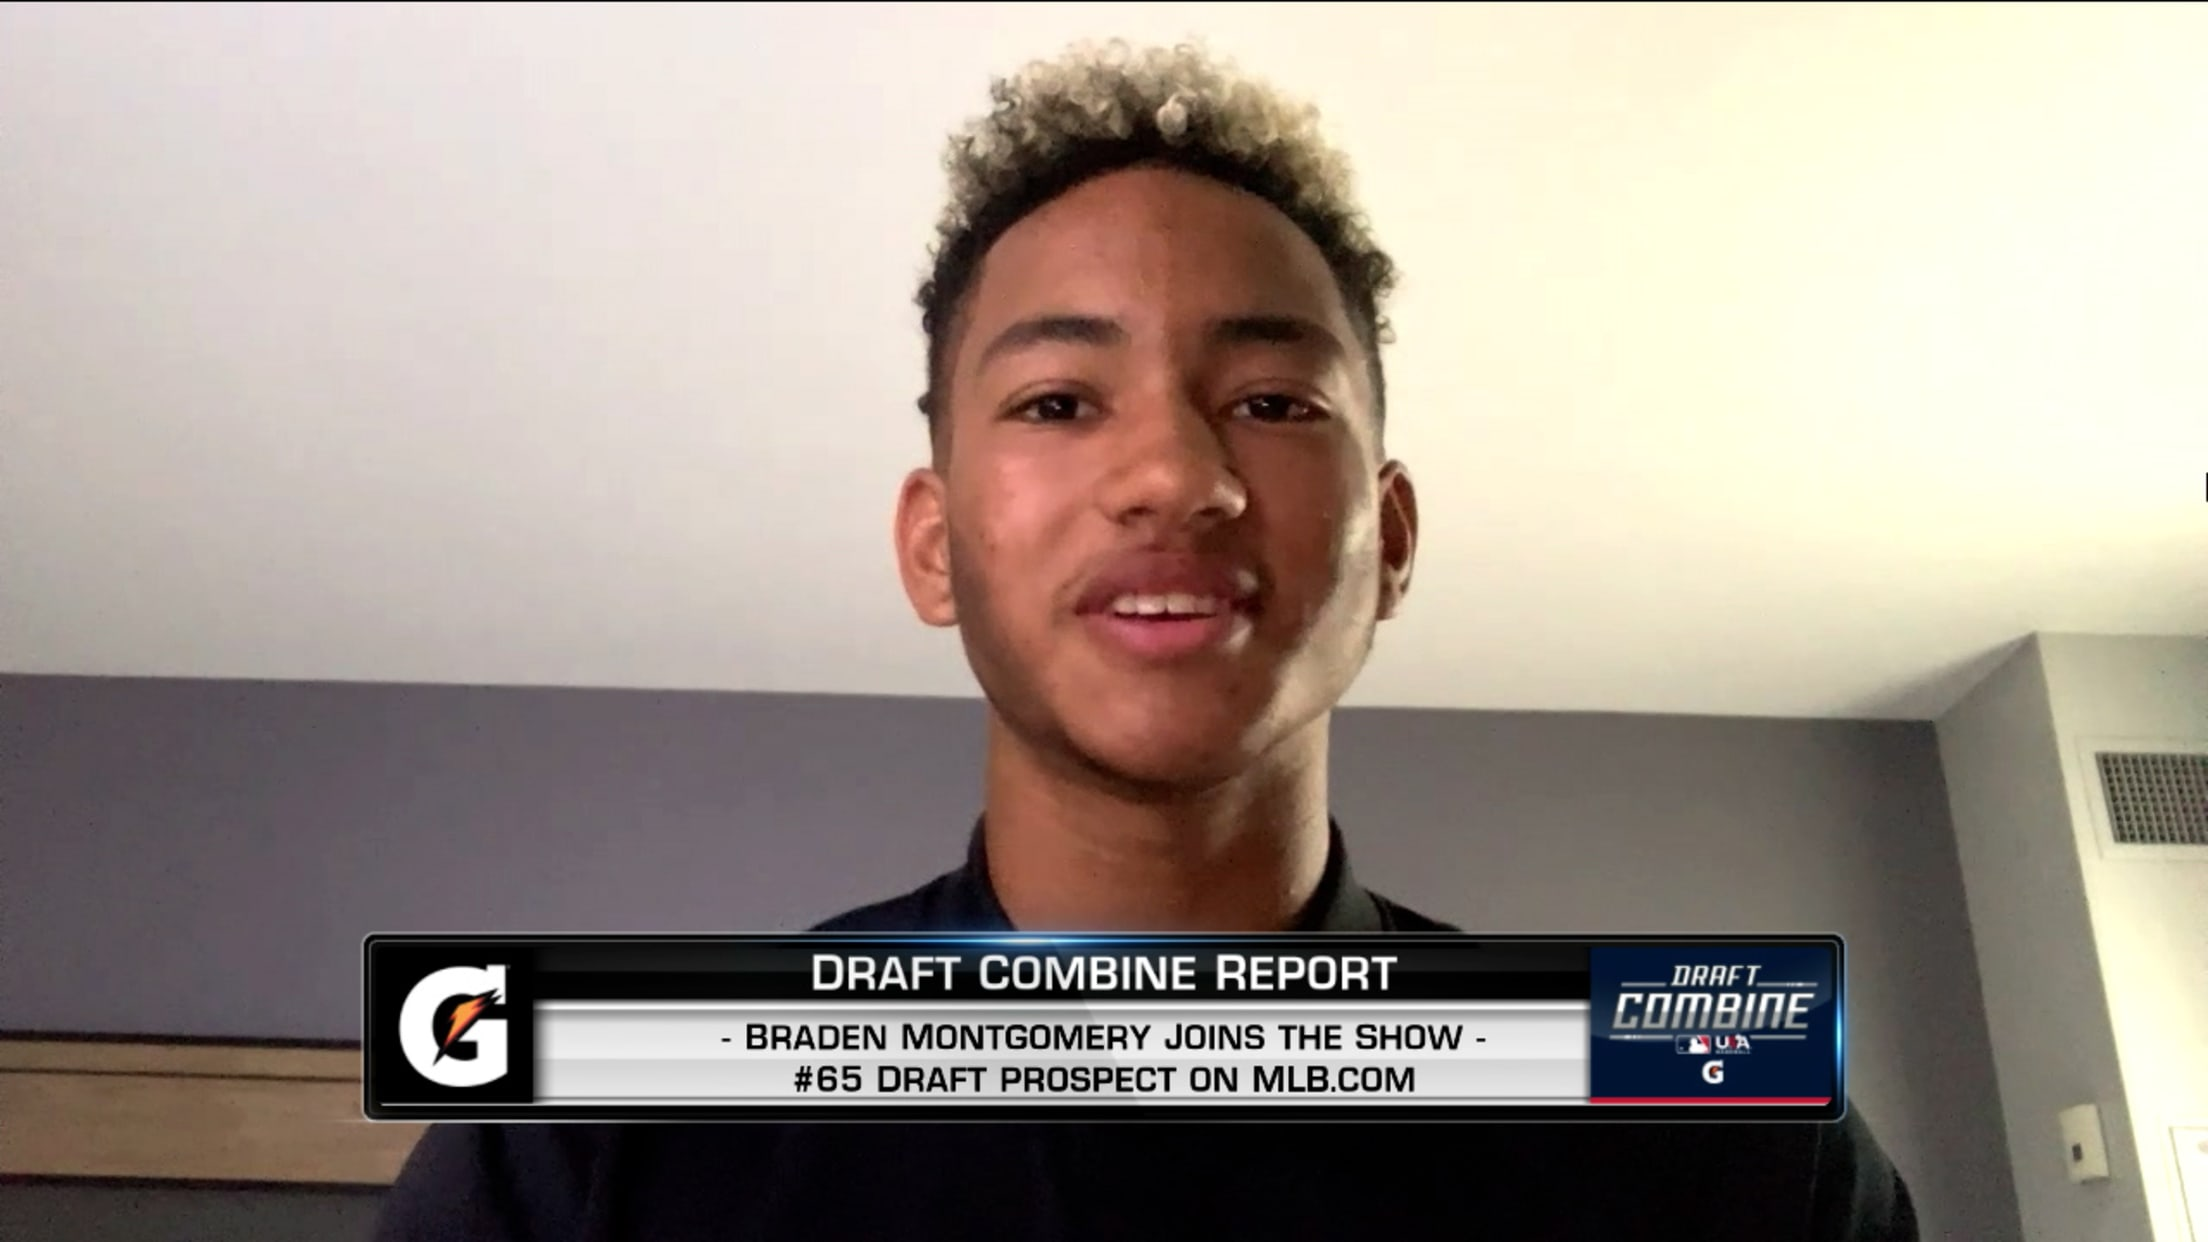 Montgomery on Draft Combine